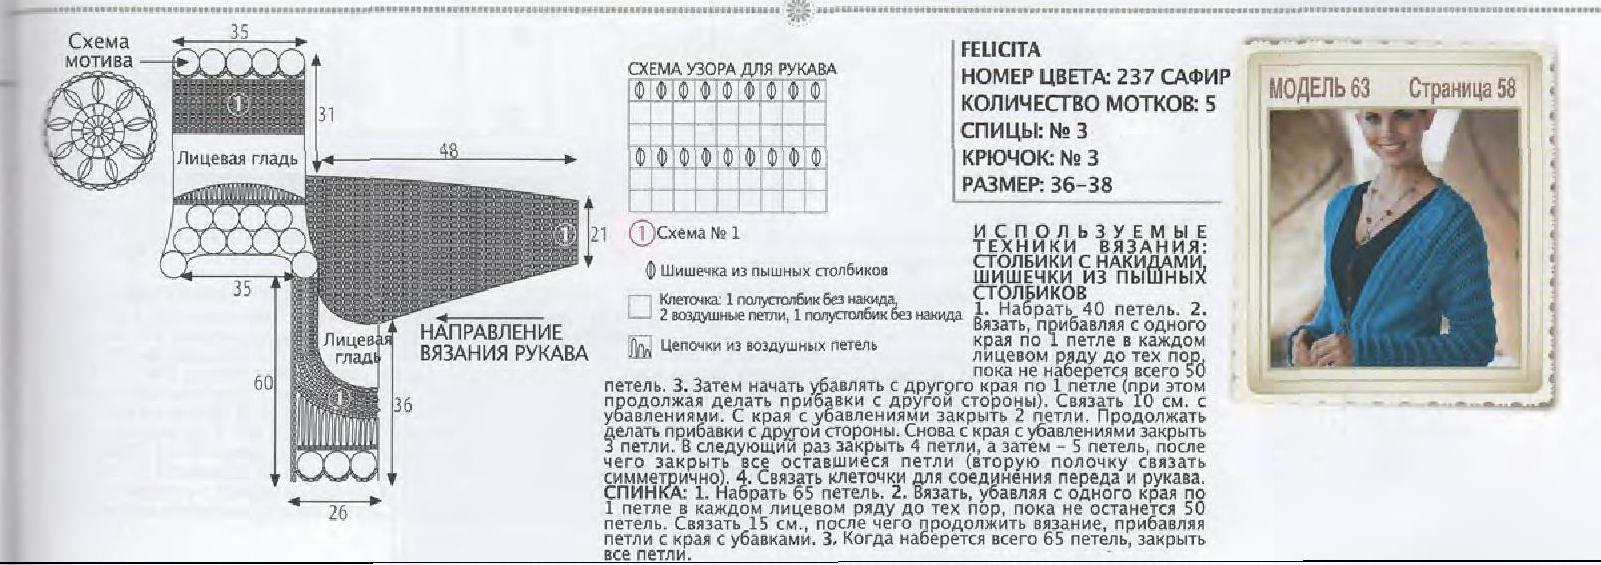 2020_Alize 2013-2014-14_60 (2)